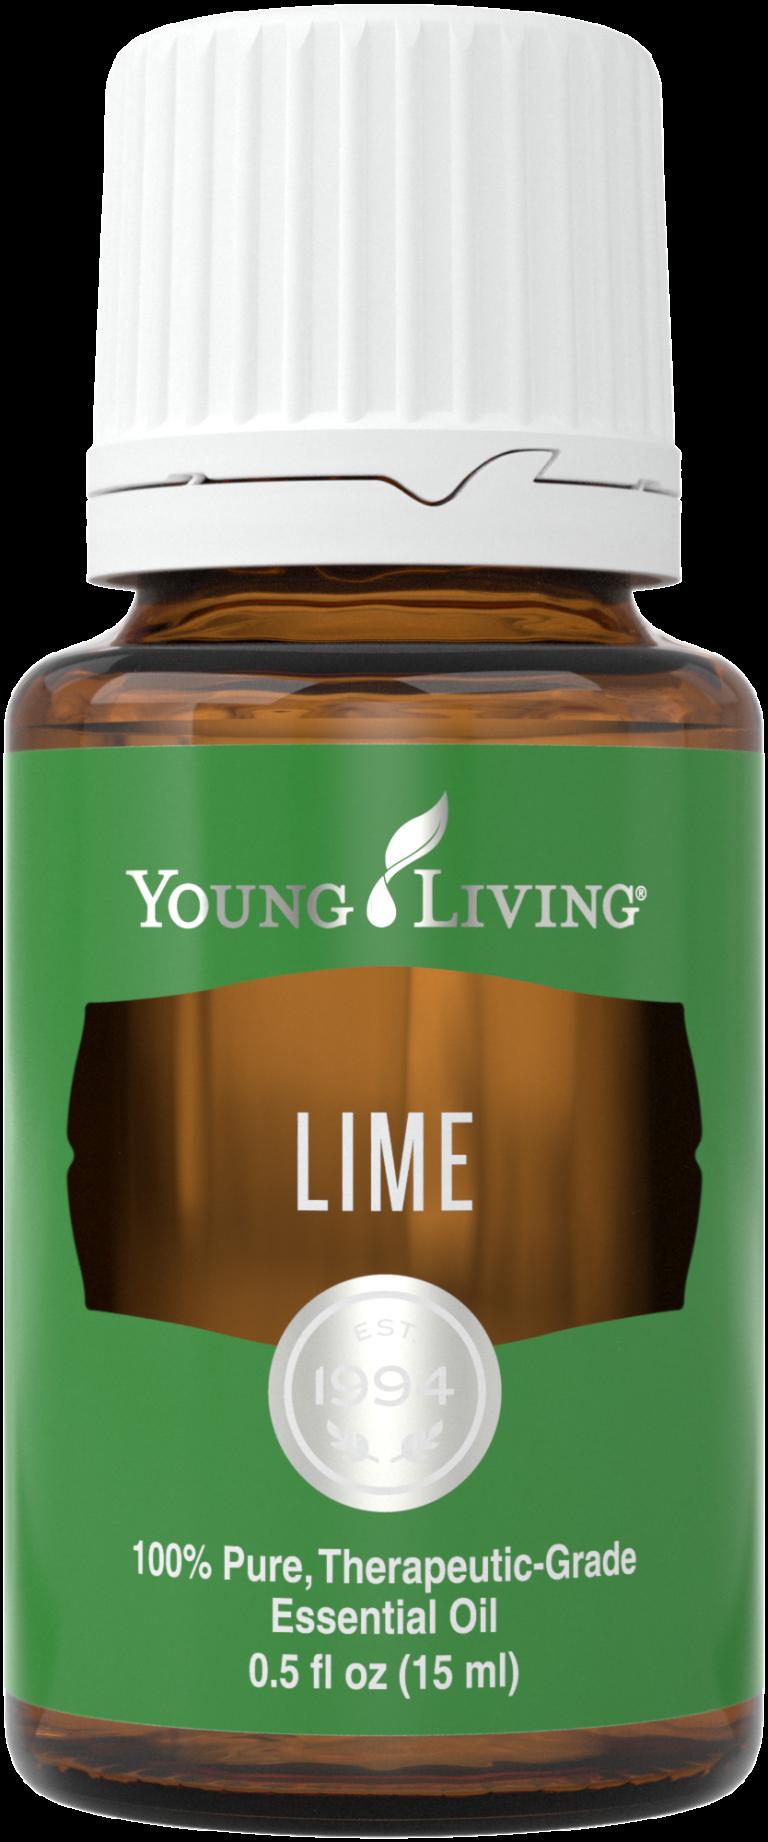 lime_15ml_silo_us_2016_24444965261_o